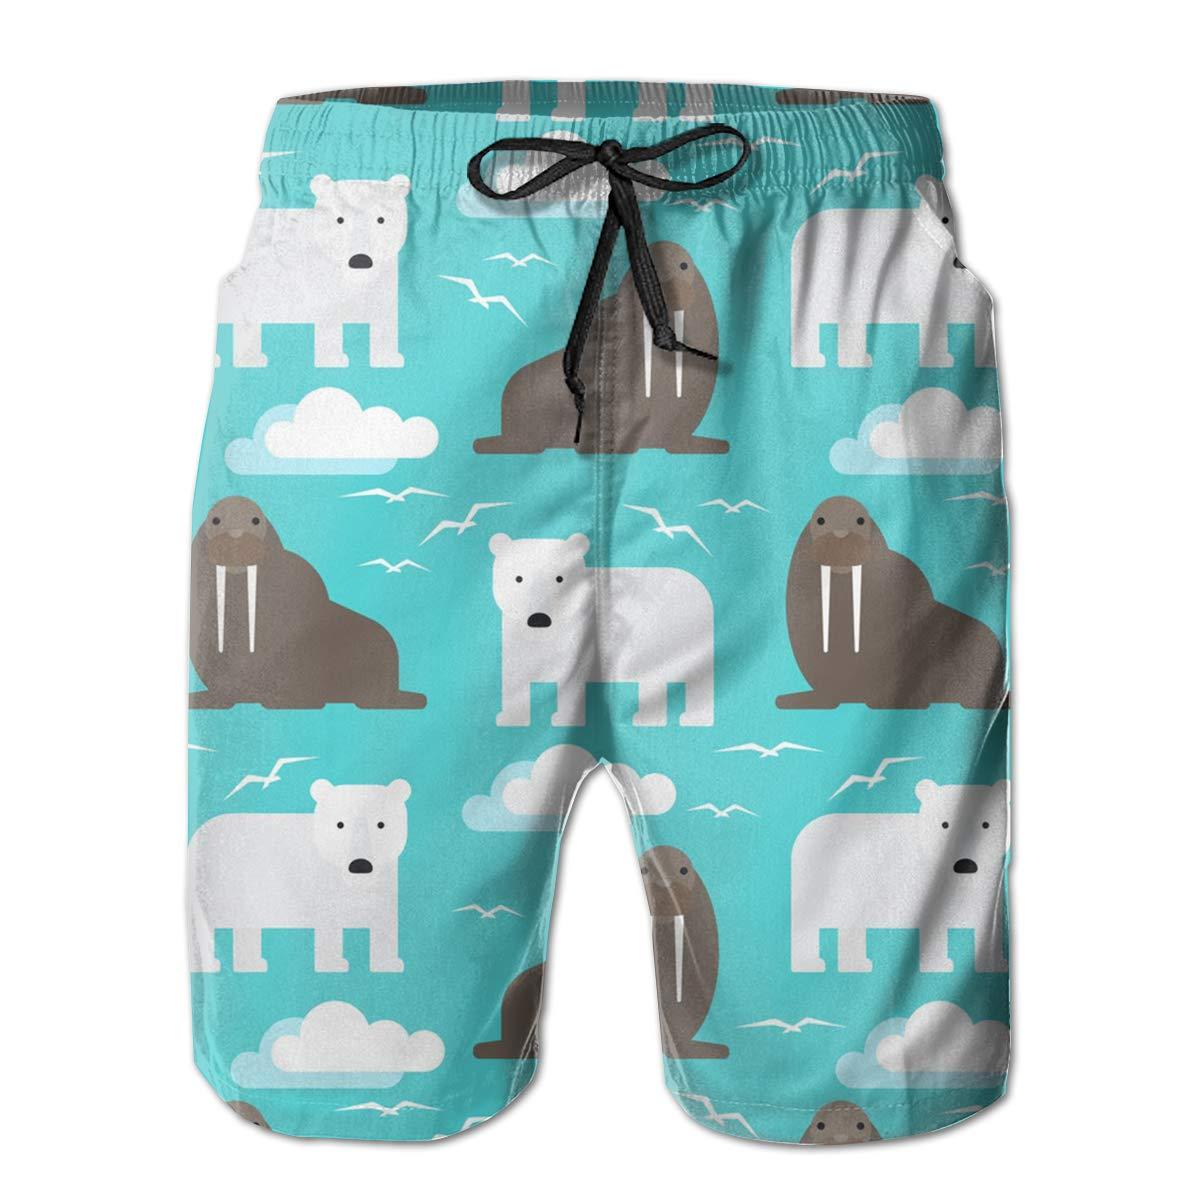 Swim Trunks Boardshorts for Men Fancy Illusion Sea Lion Animal Funny Boy Men S Shorts